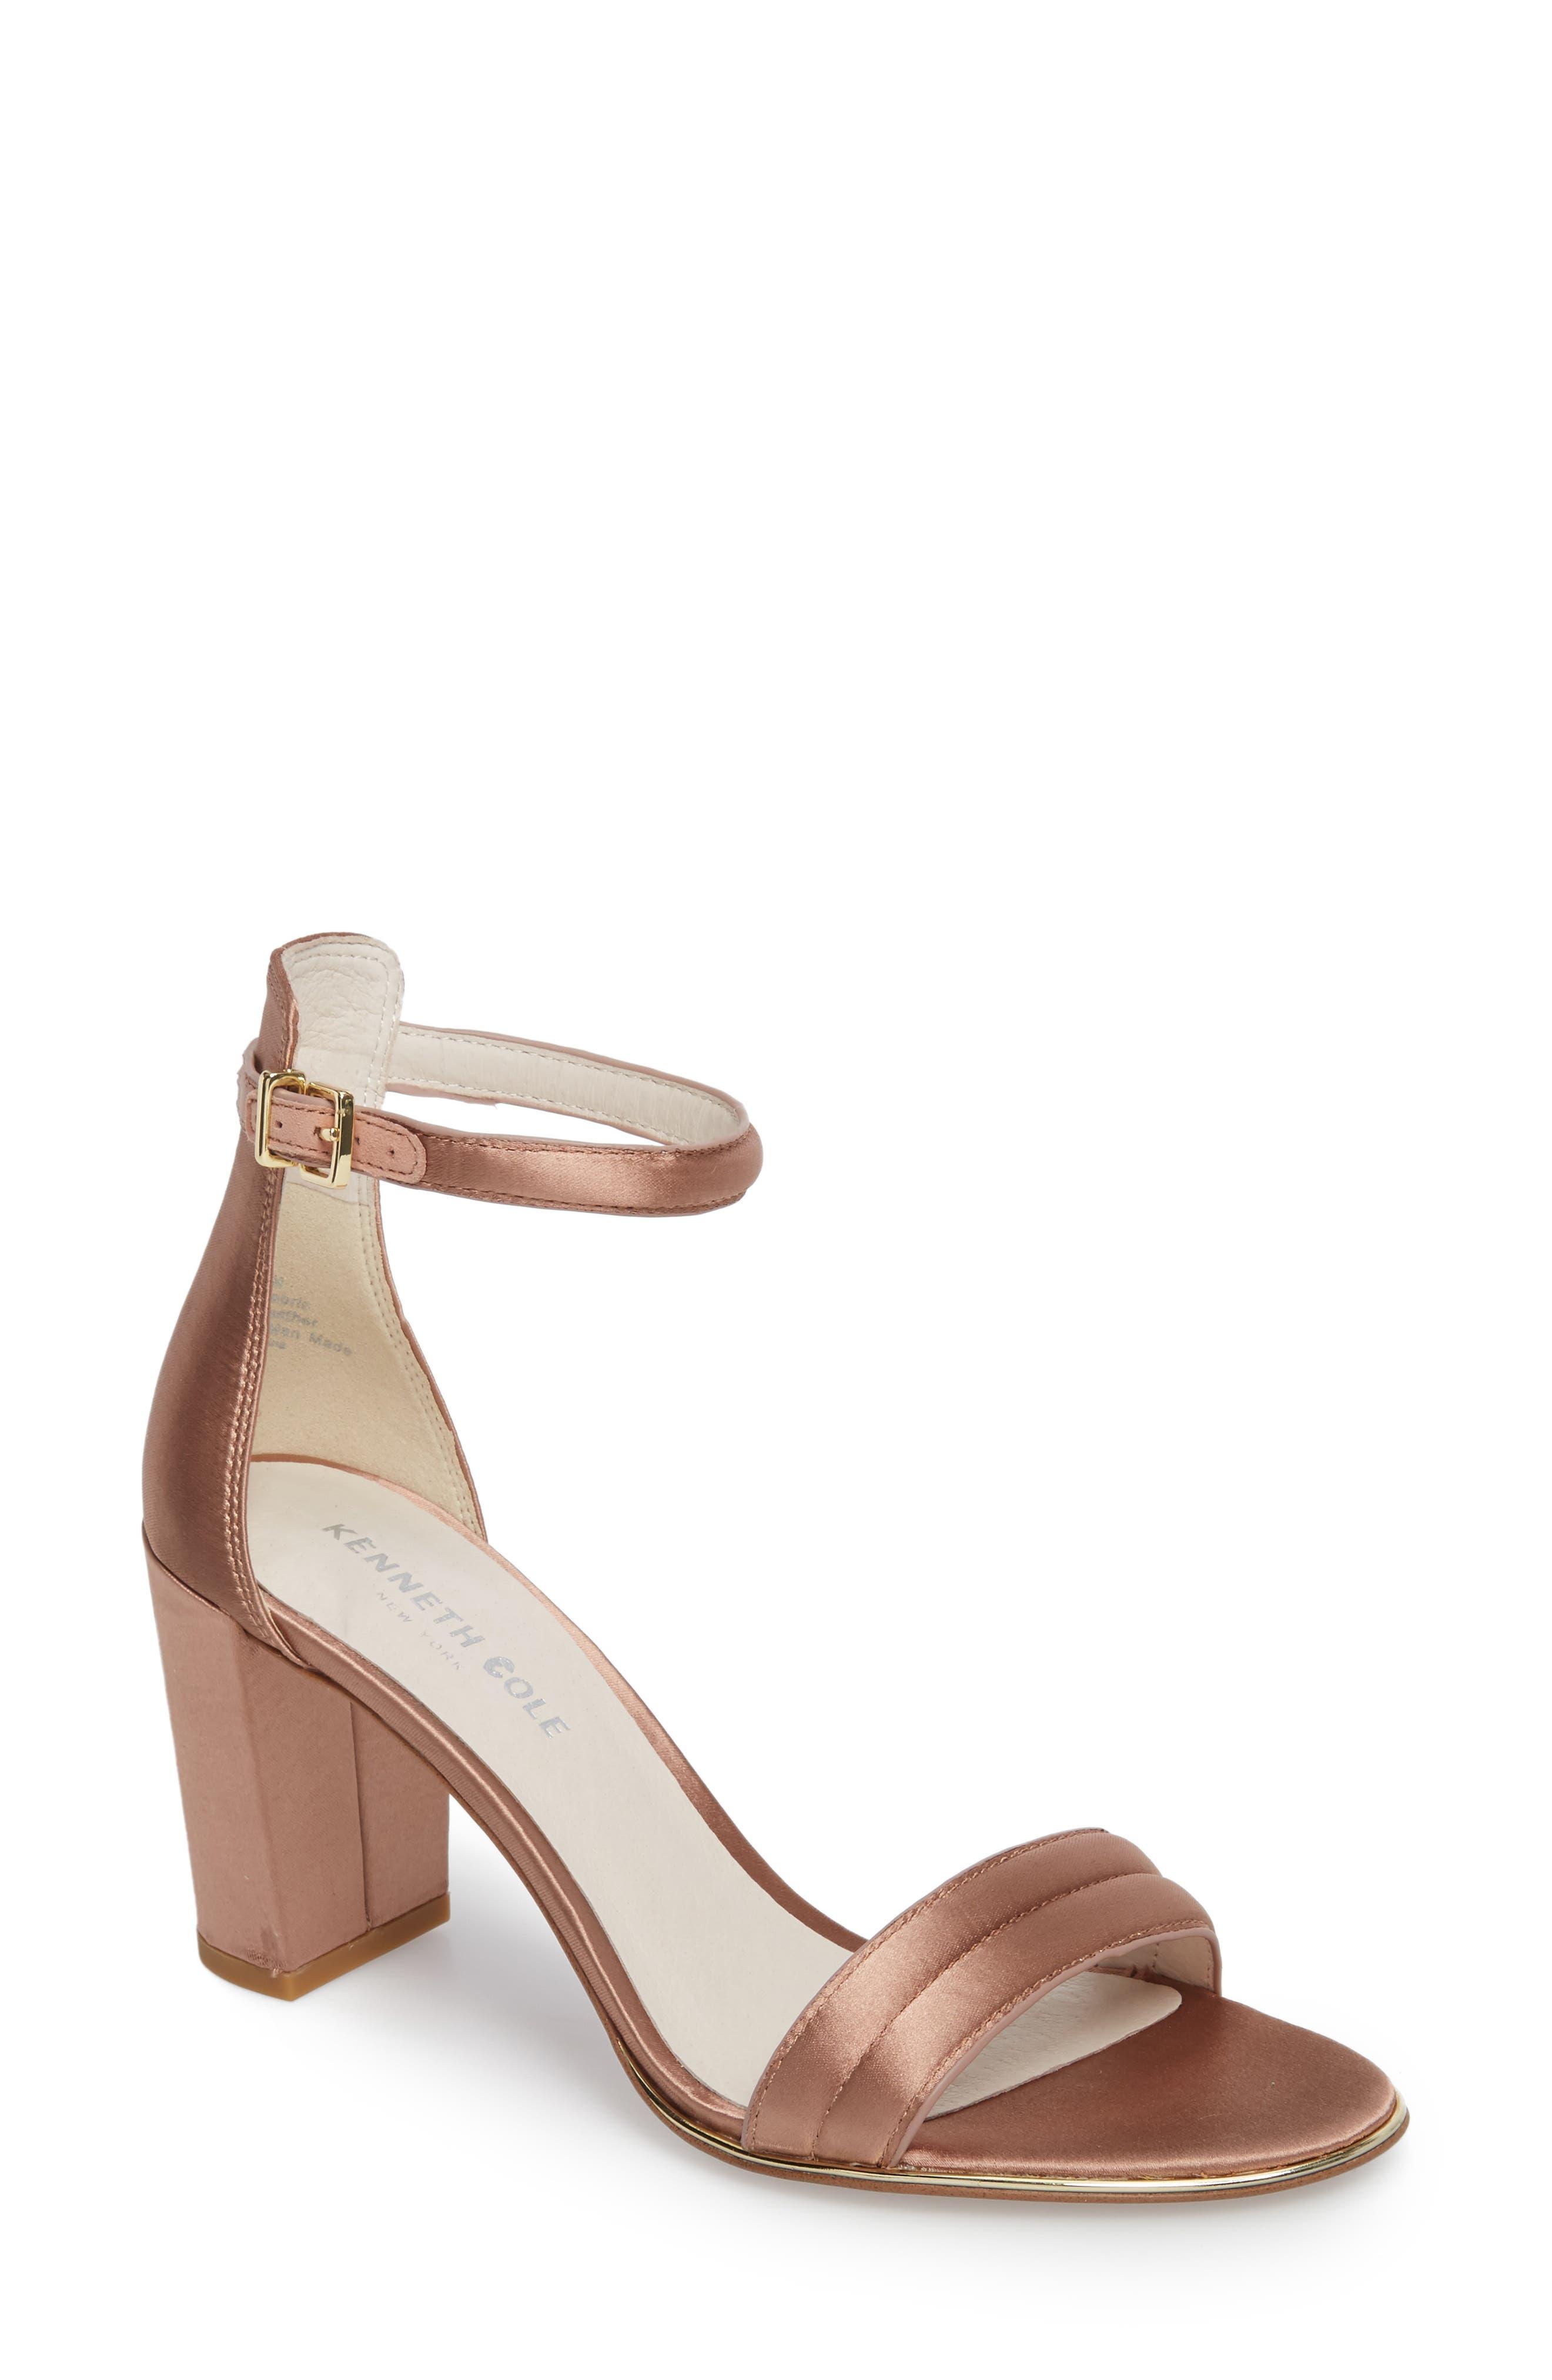 Kenneth Cole New York 'Lex' Ankle Strap Sandal (Women)